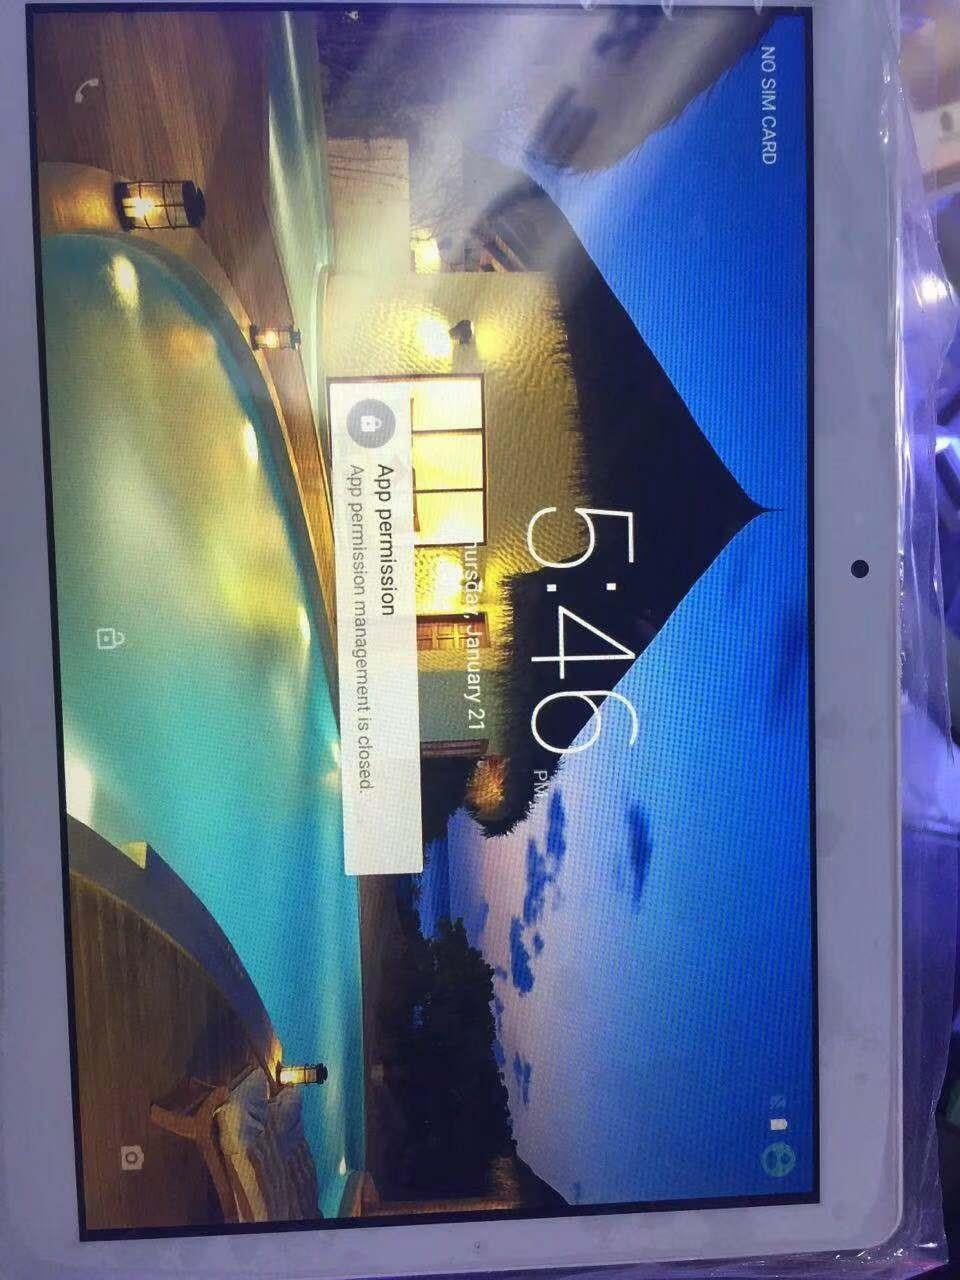 Phone Call Tablet PC Dual SIM WCDMA Phablet A10 Ebook